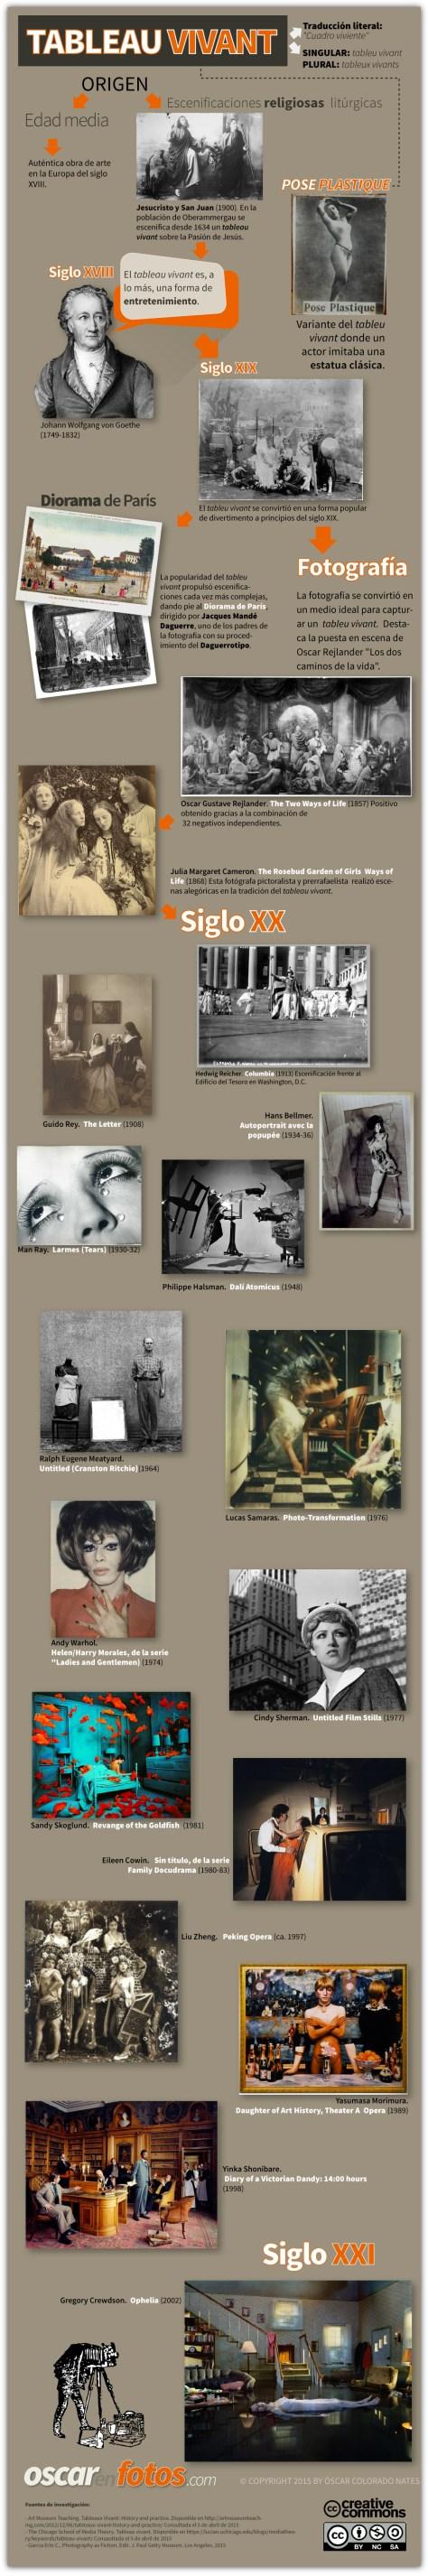 tableau_vivant_infografico_cindy_sherman